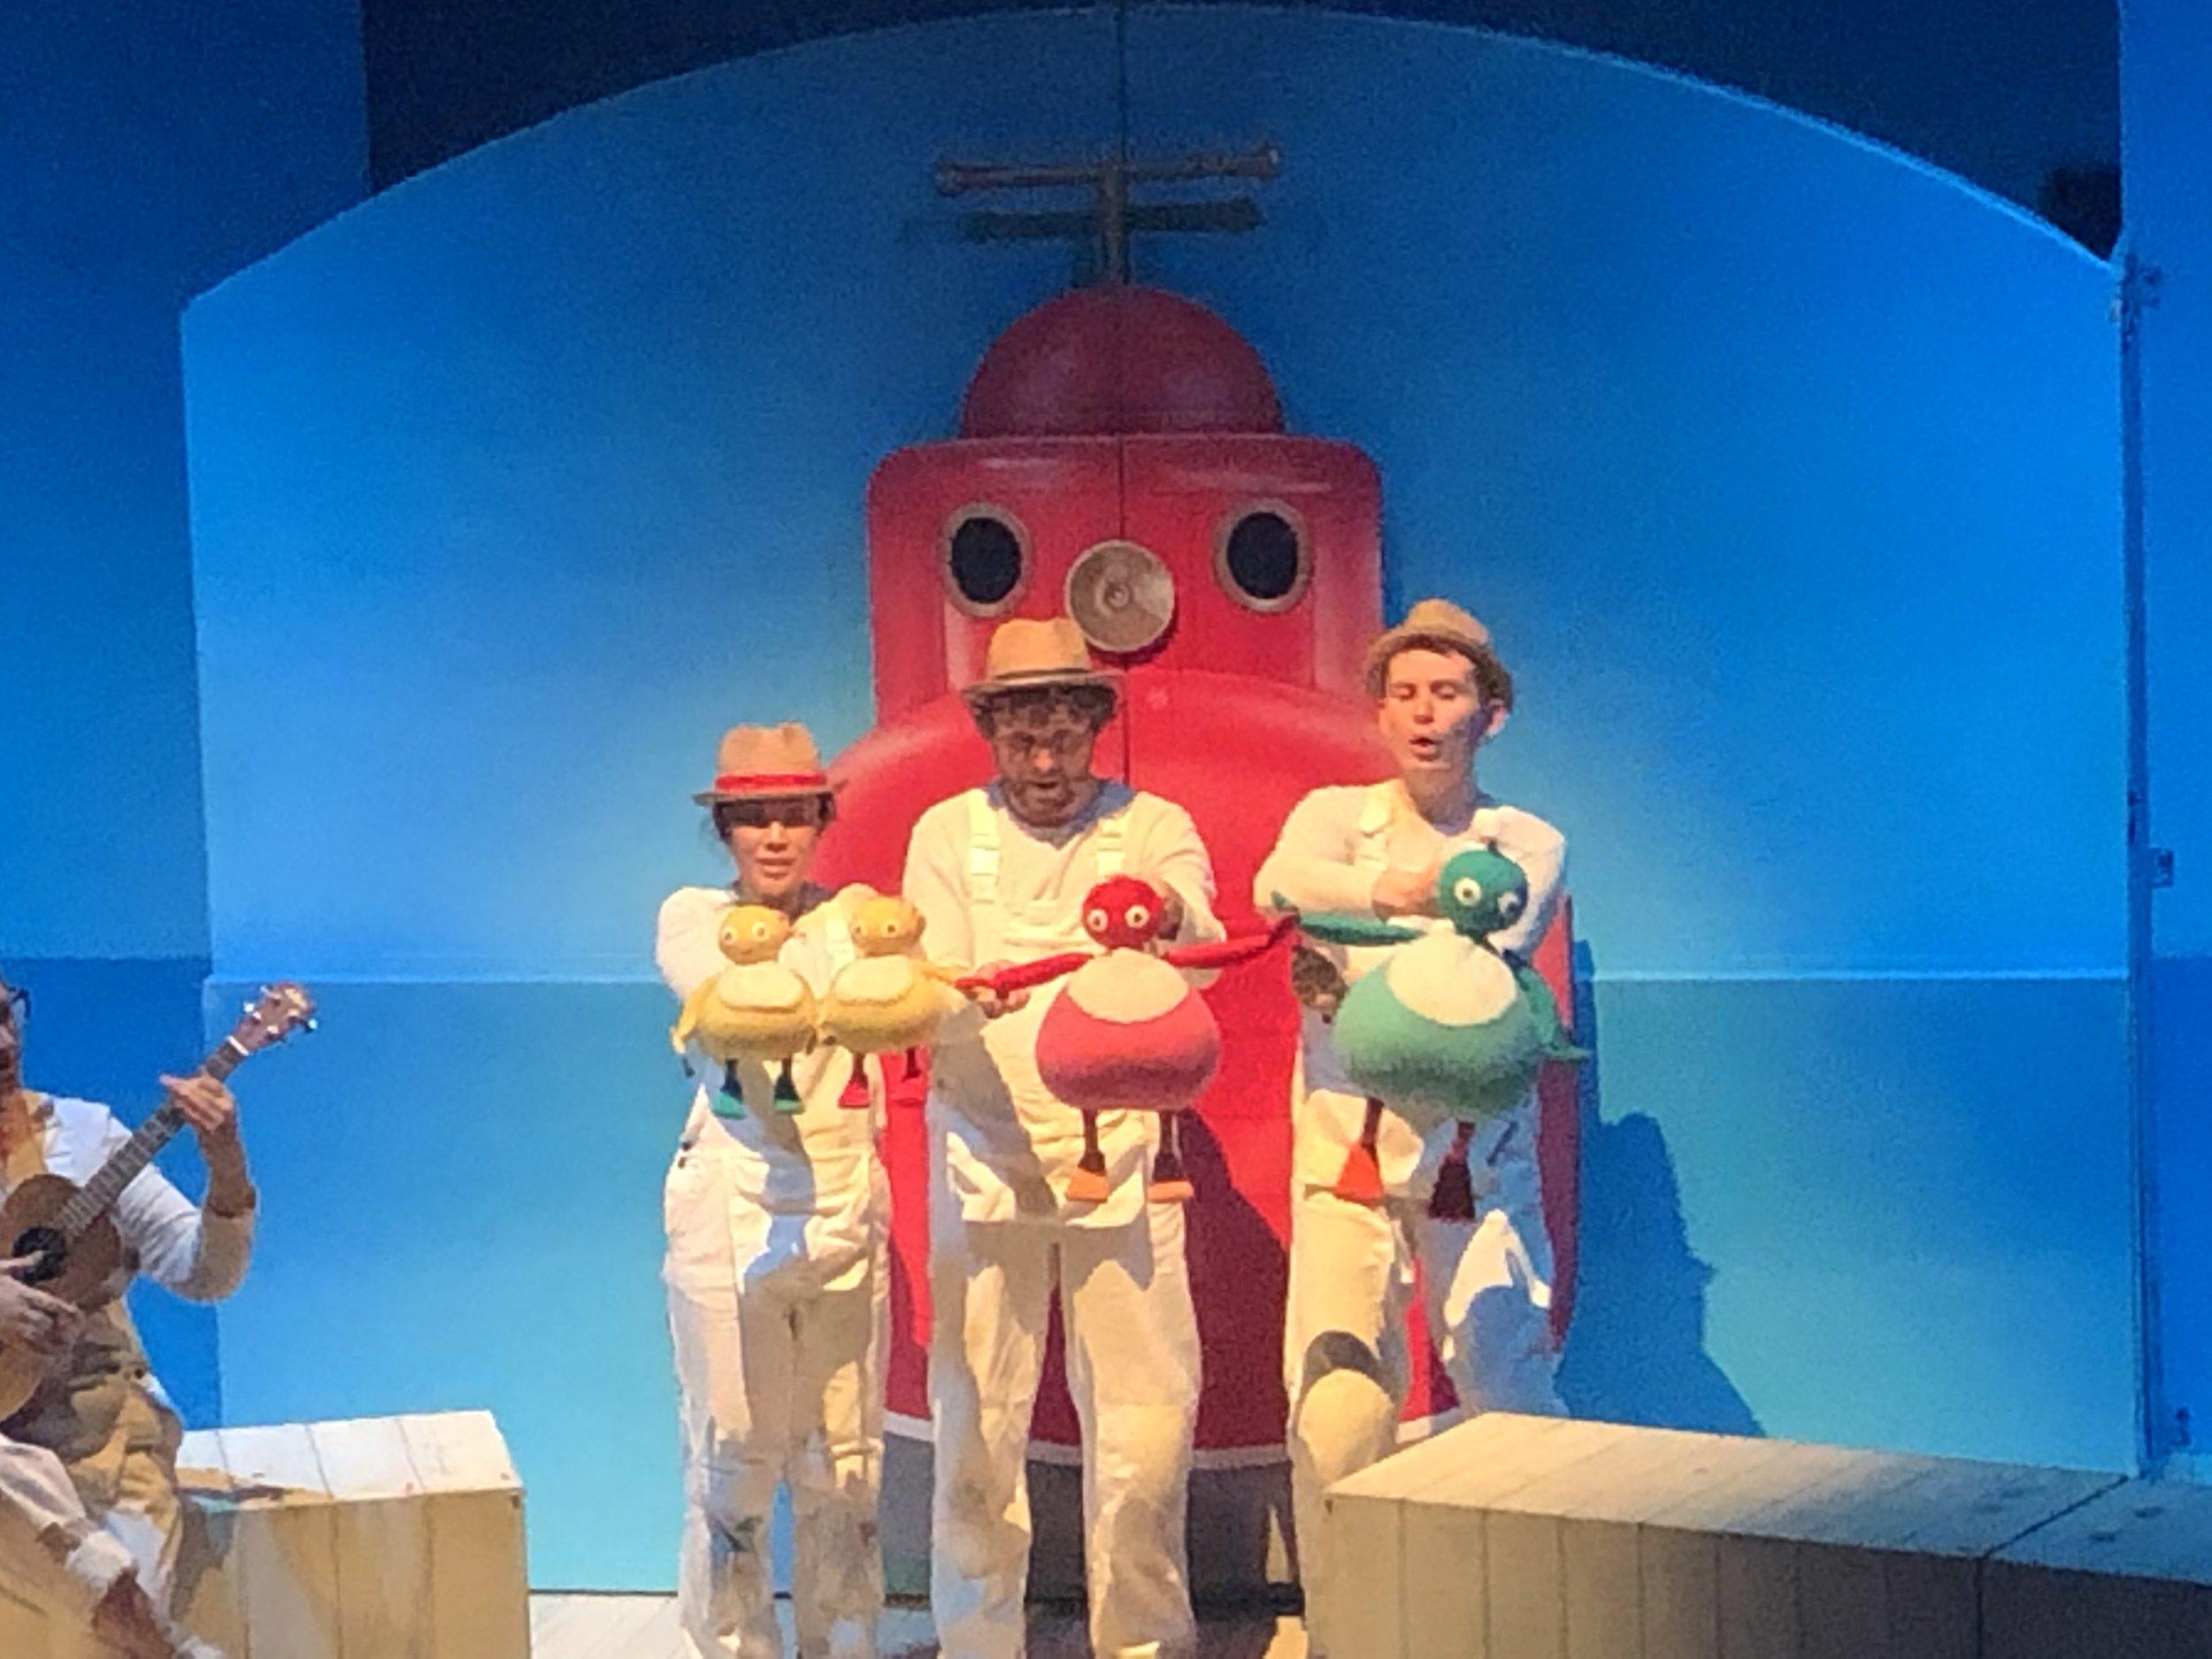 twirlywoos-live-theatre-pre-schooler-under-fives-day-out-kent-tunbridge-wells-support-local-magazine.jpg-0.jpg